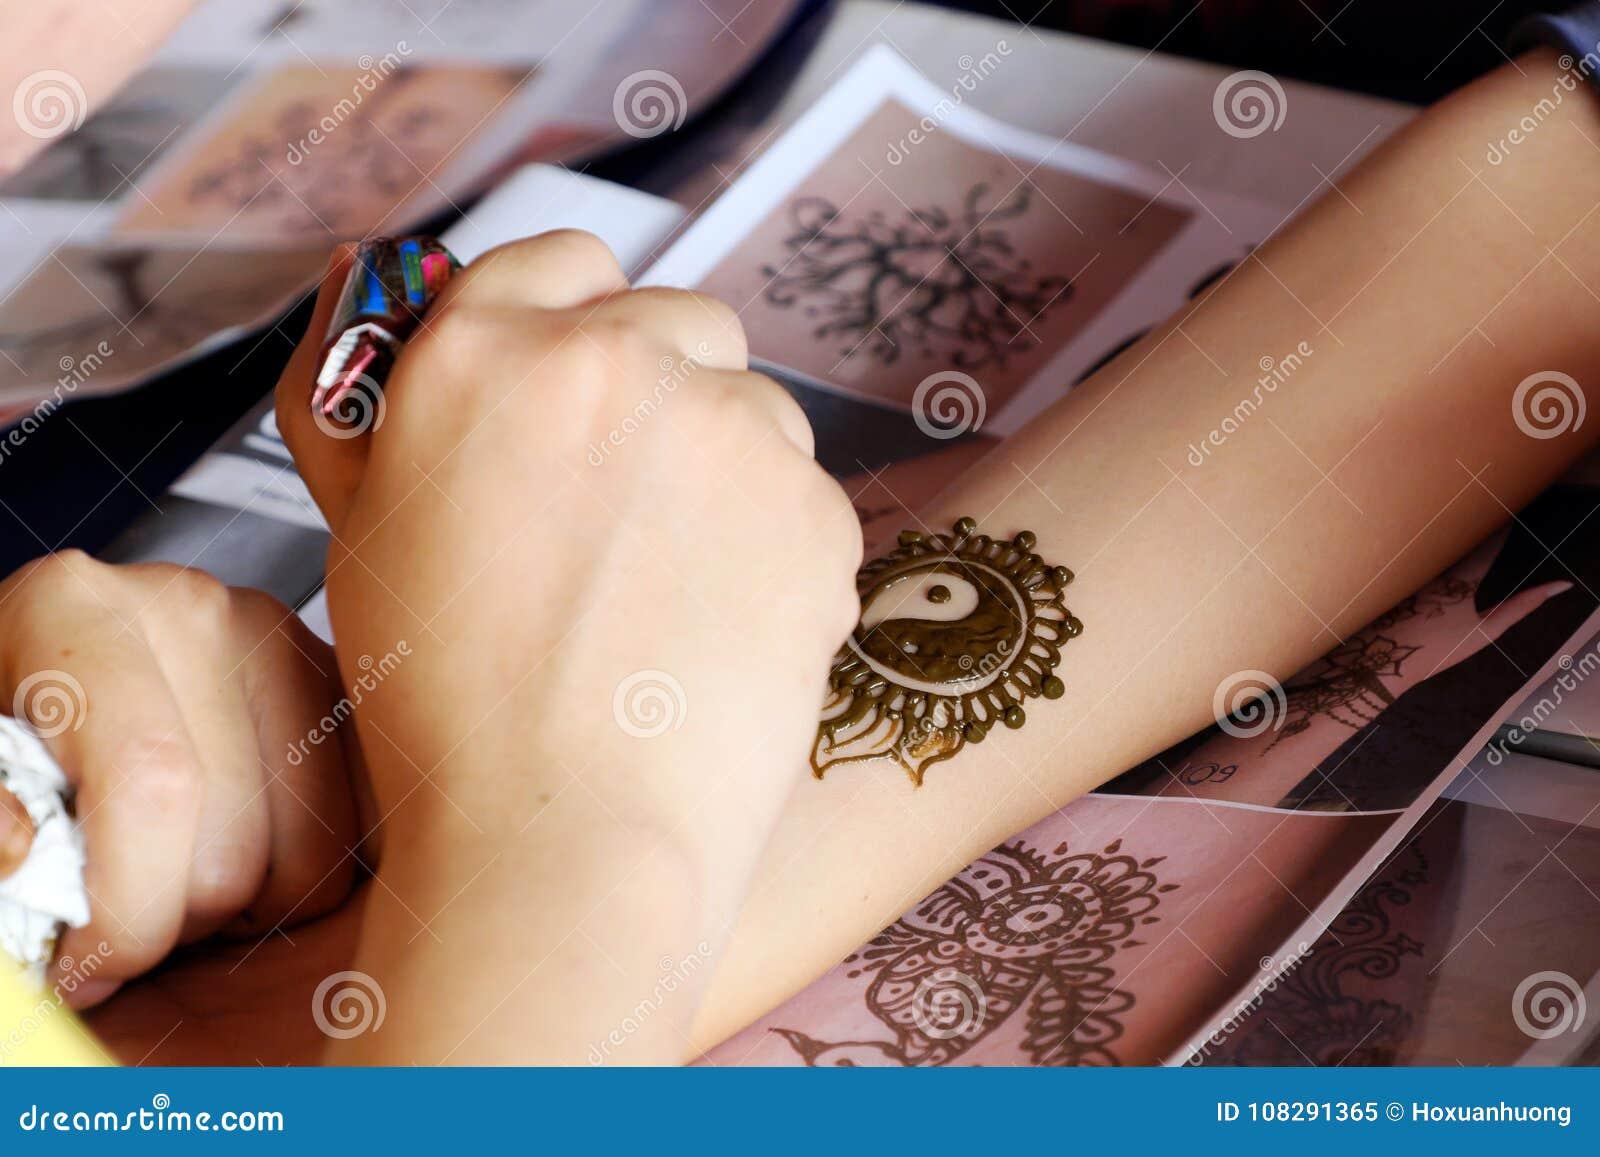 Artist Drawing Henna Indian Mehndi Editorial Image Image Of